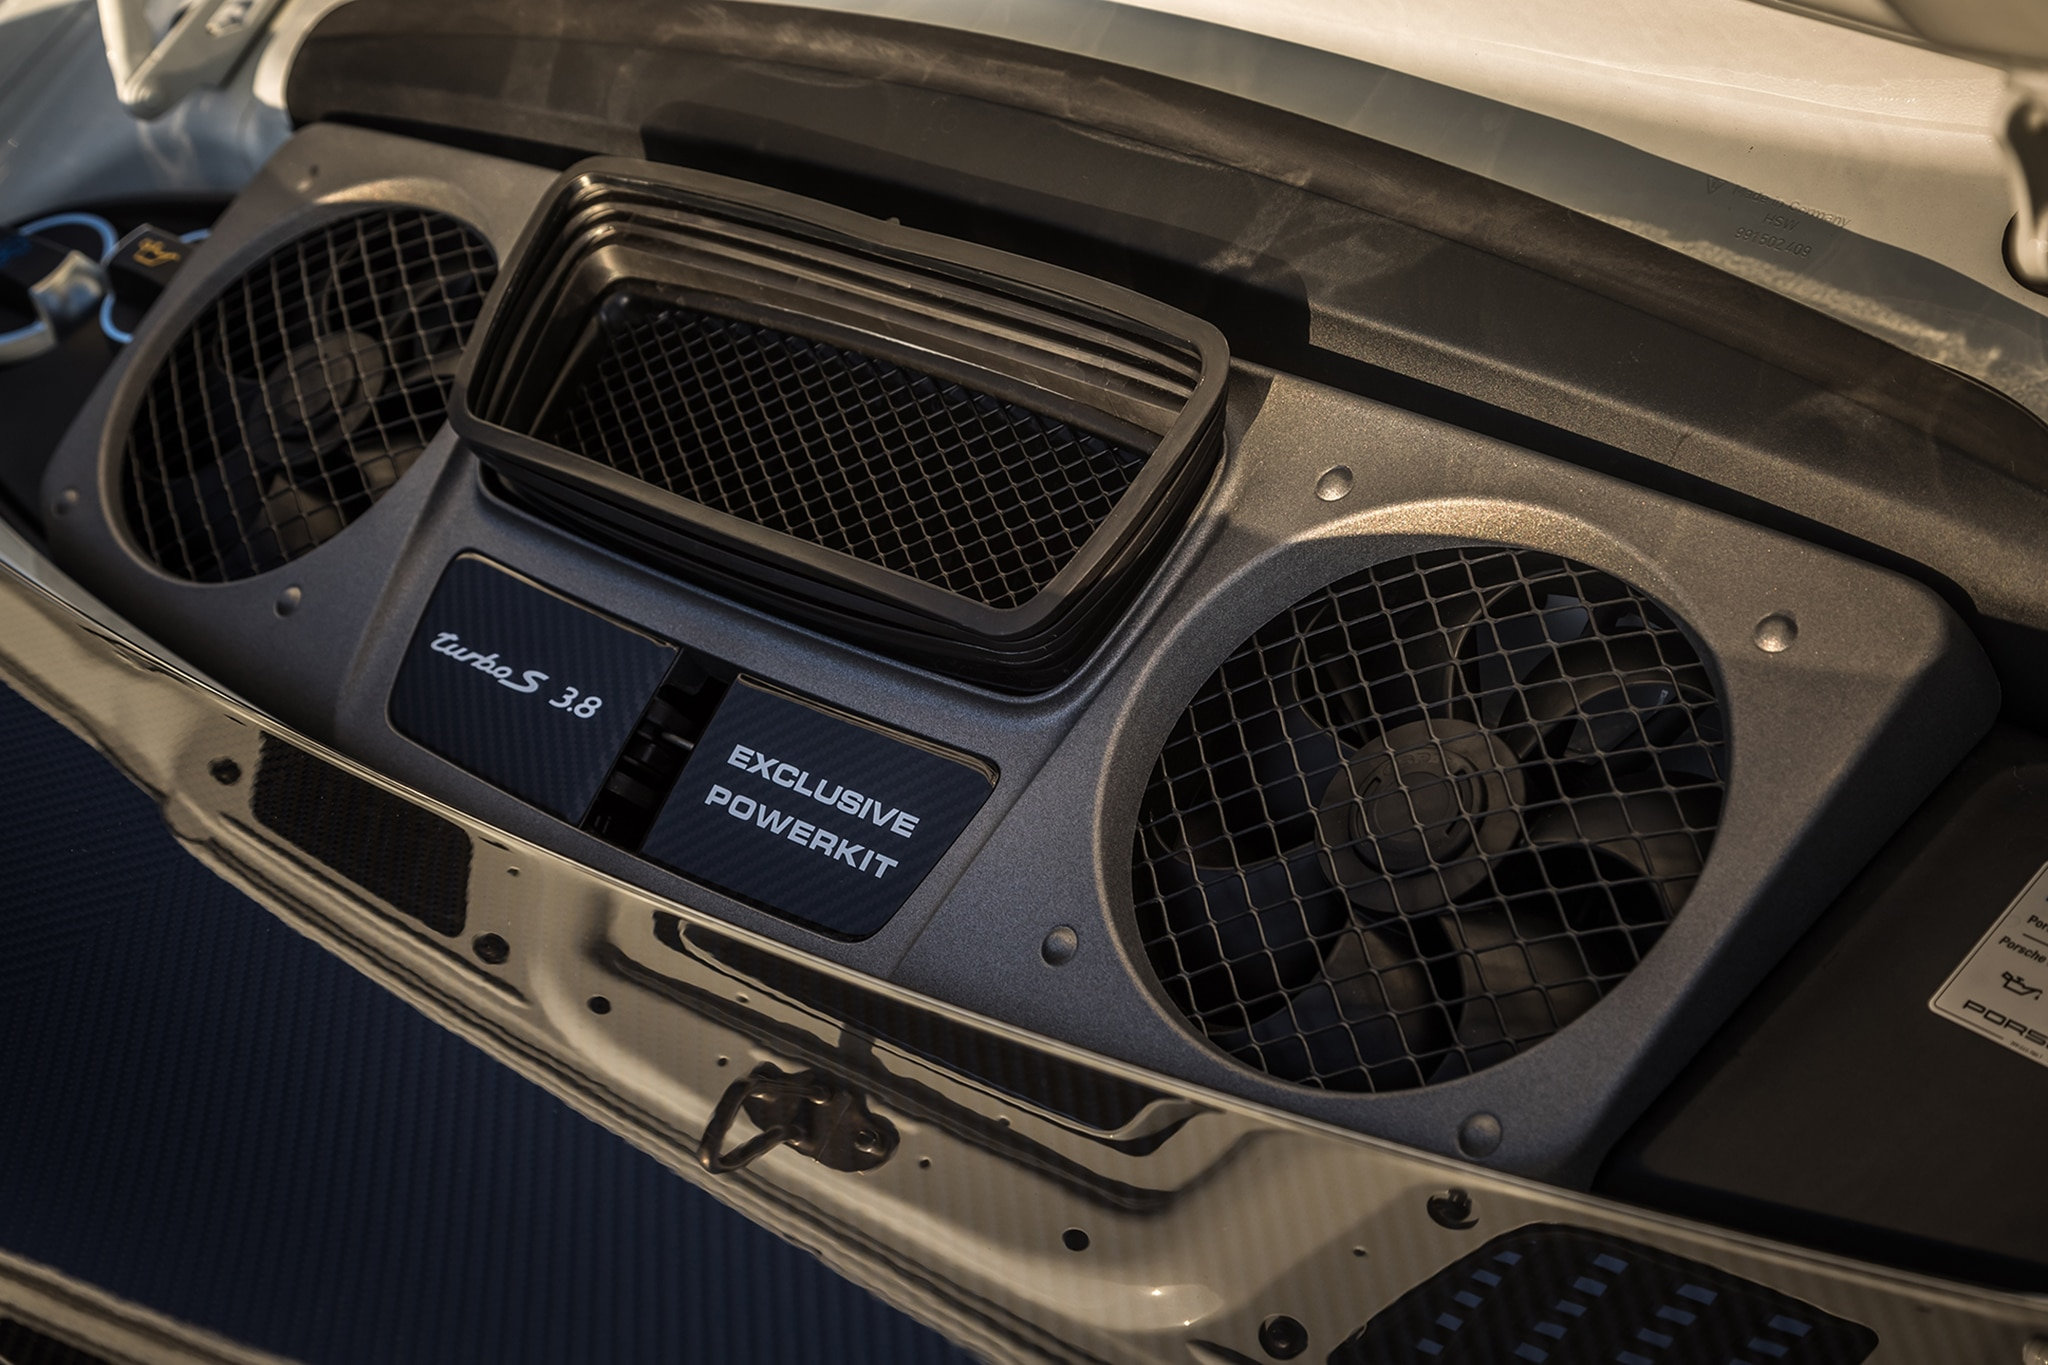 2018 Porsche 911 Turbo S Exclusive Engine